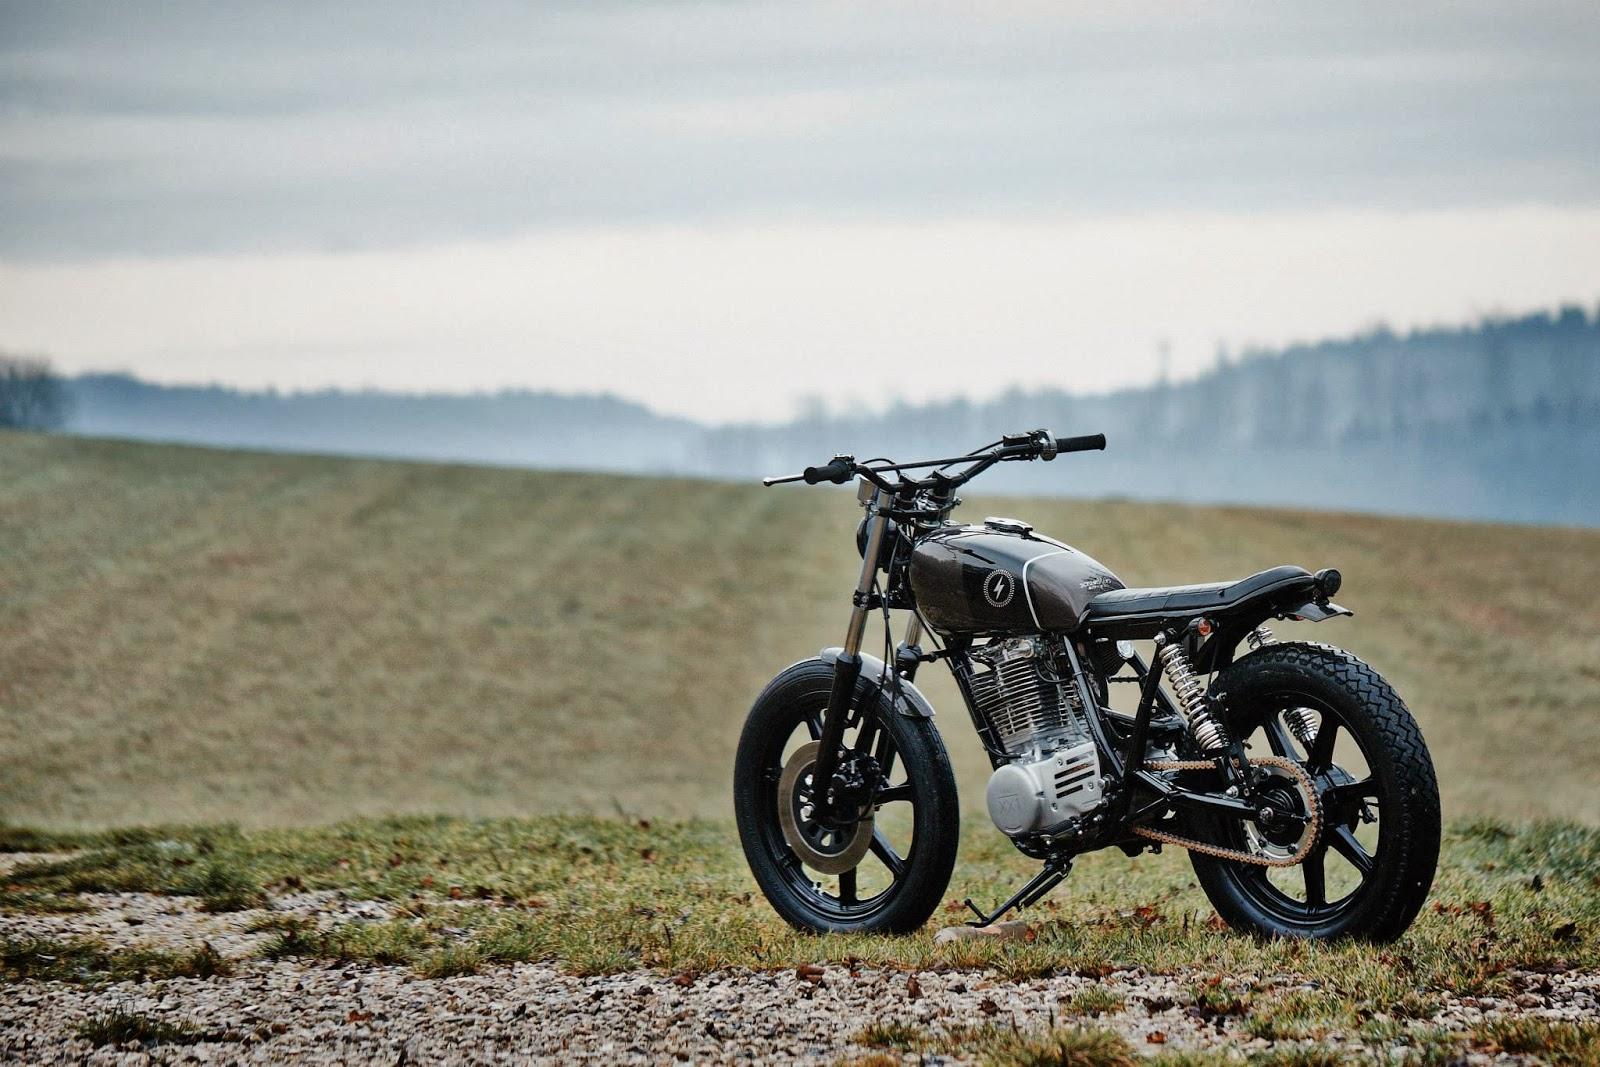 Racing Caf U00e8  Yamaha Sr  U0026quot Krad Xx1 U0026quot  By Scramblers Motorcycles